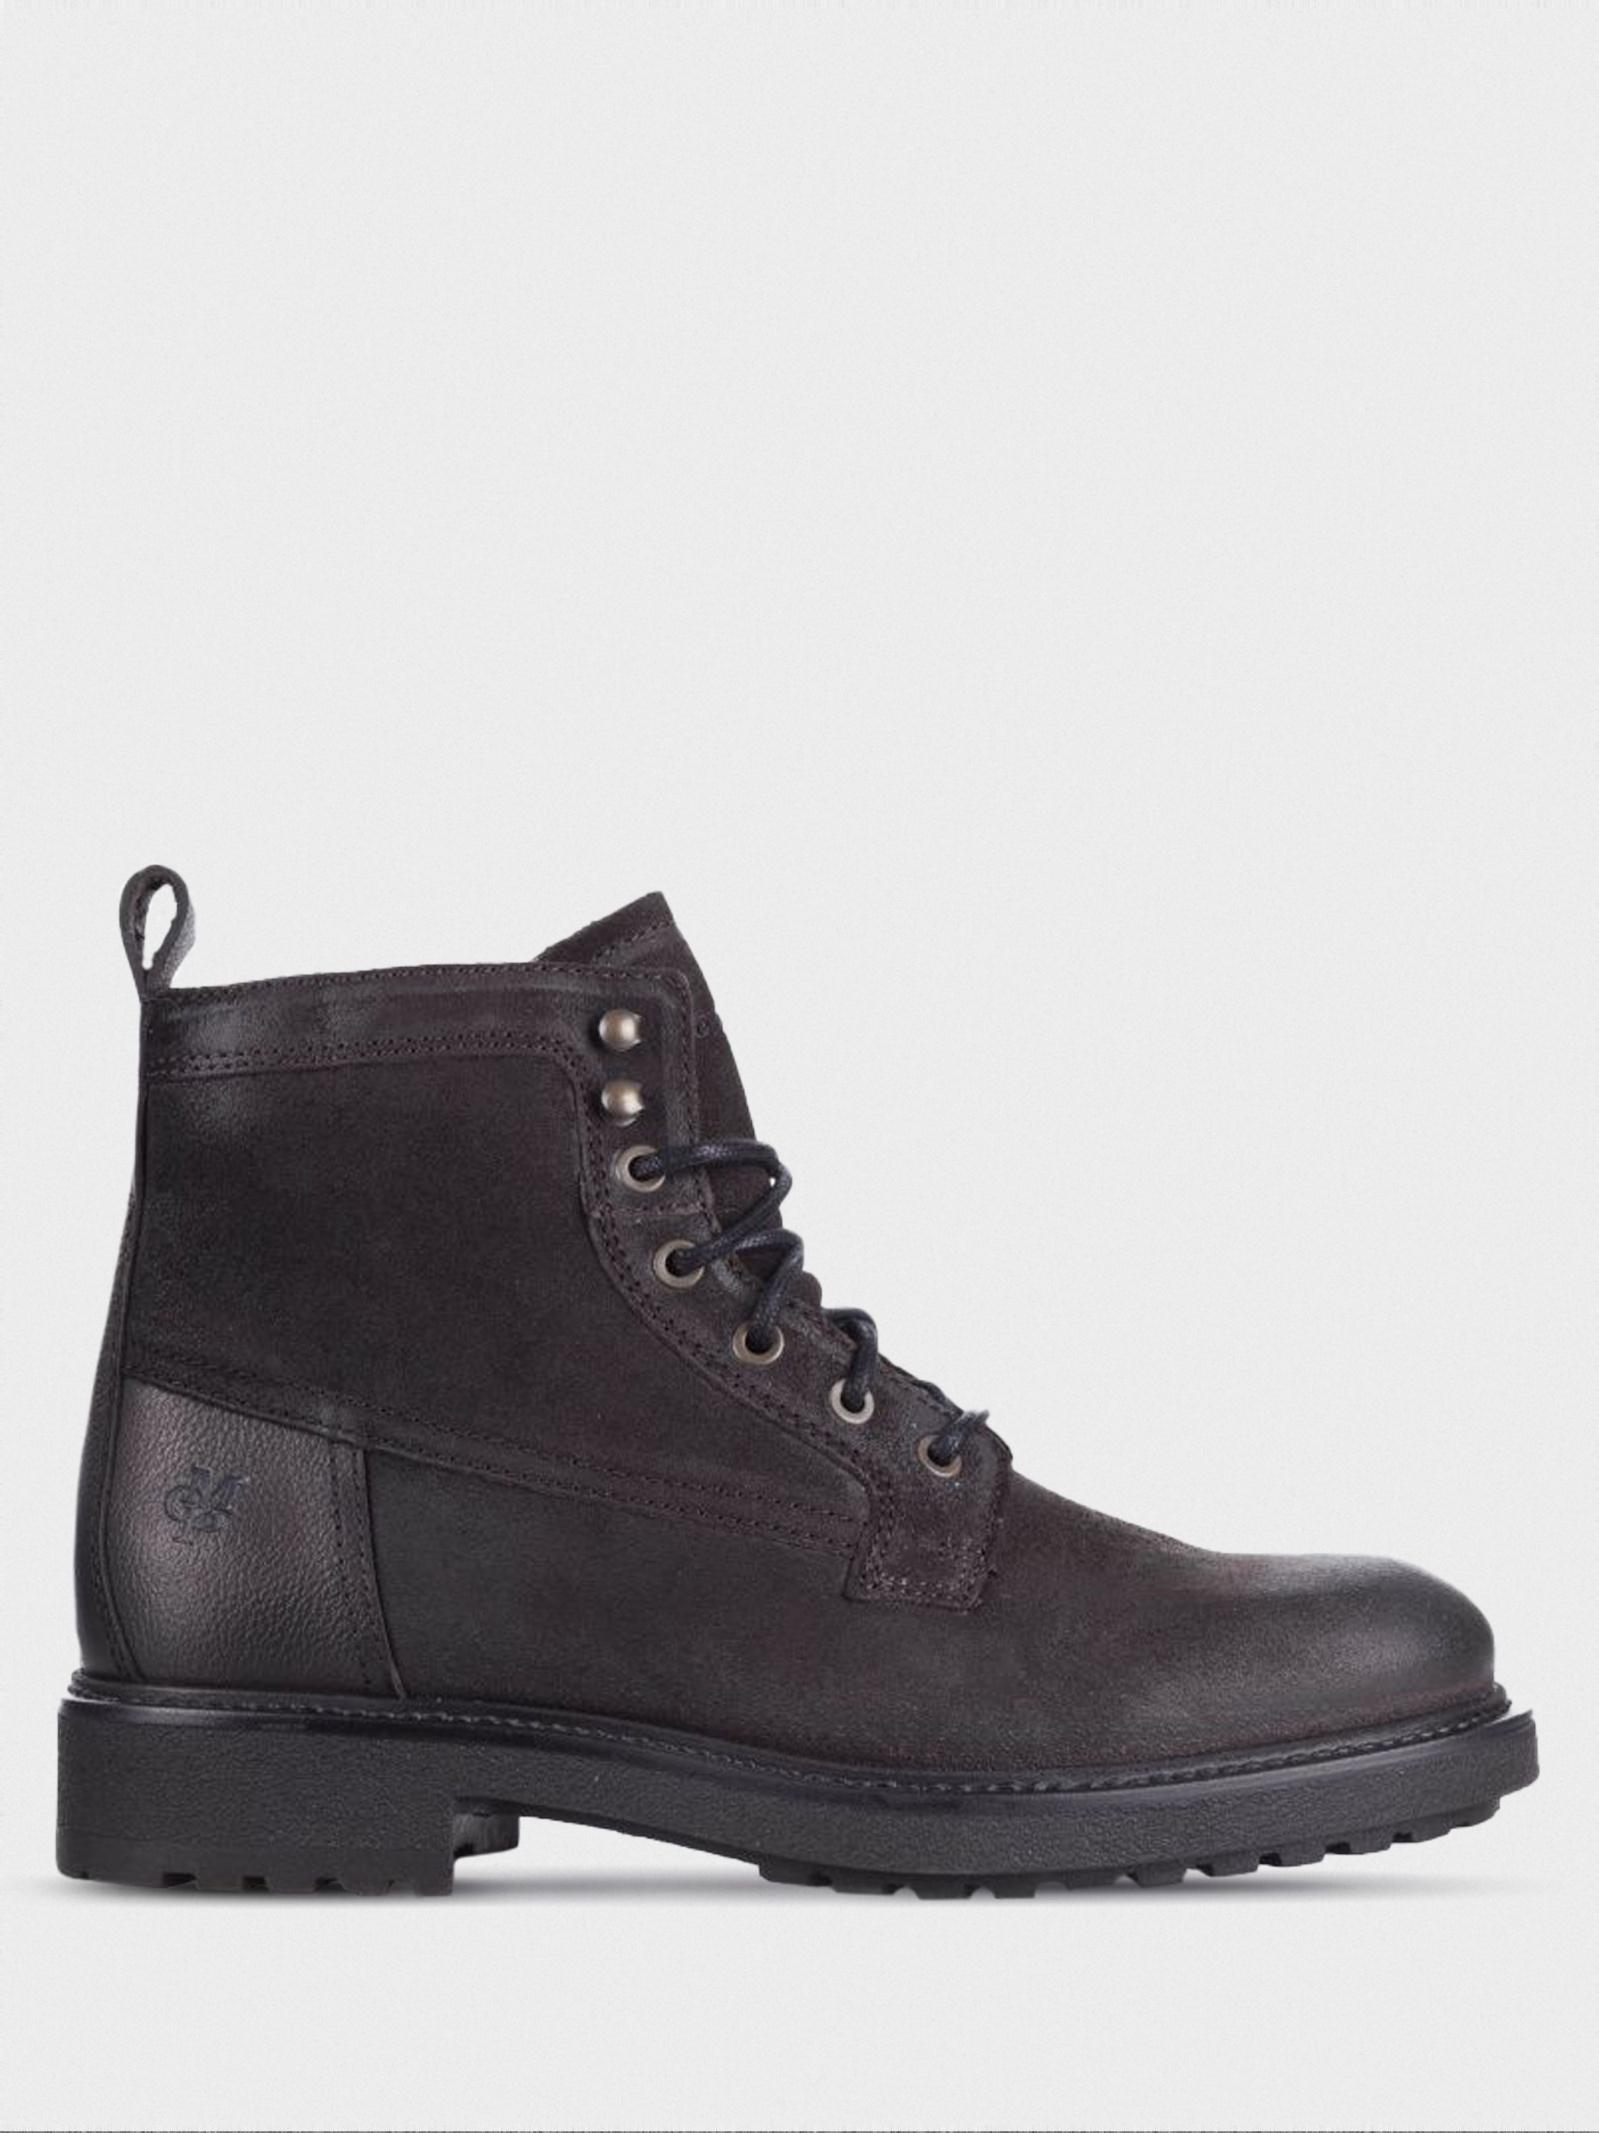 Ботинки мужские MARC O'POLO PO355 размерная сетка обуви, 2017